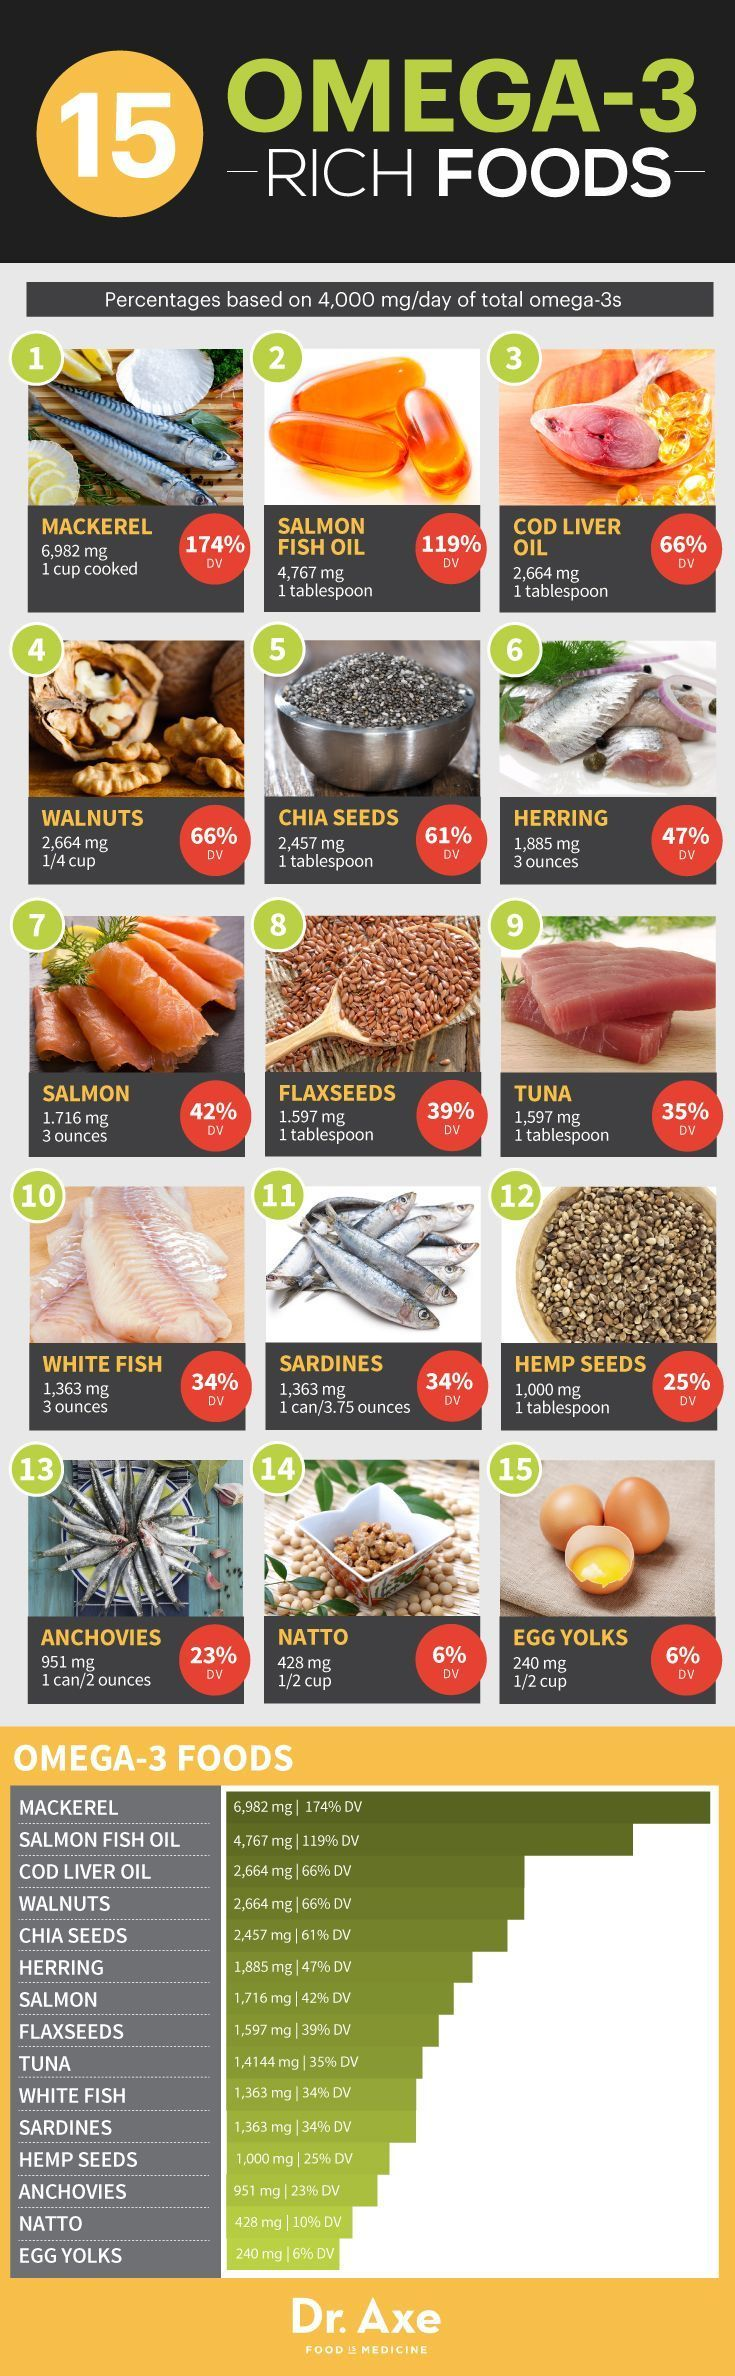 Omega-3 foods http://www.draxe.com #health #holistic #natural